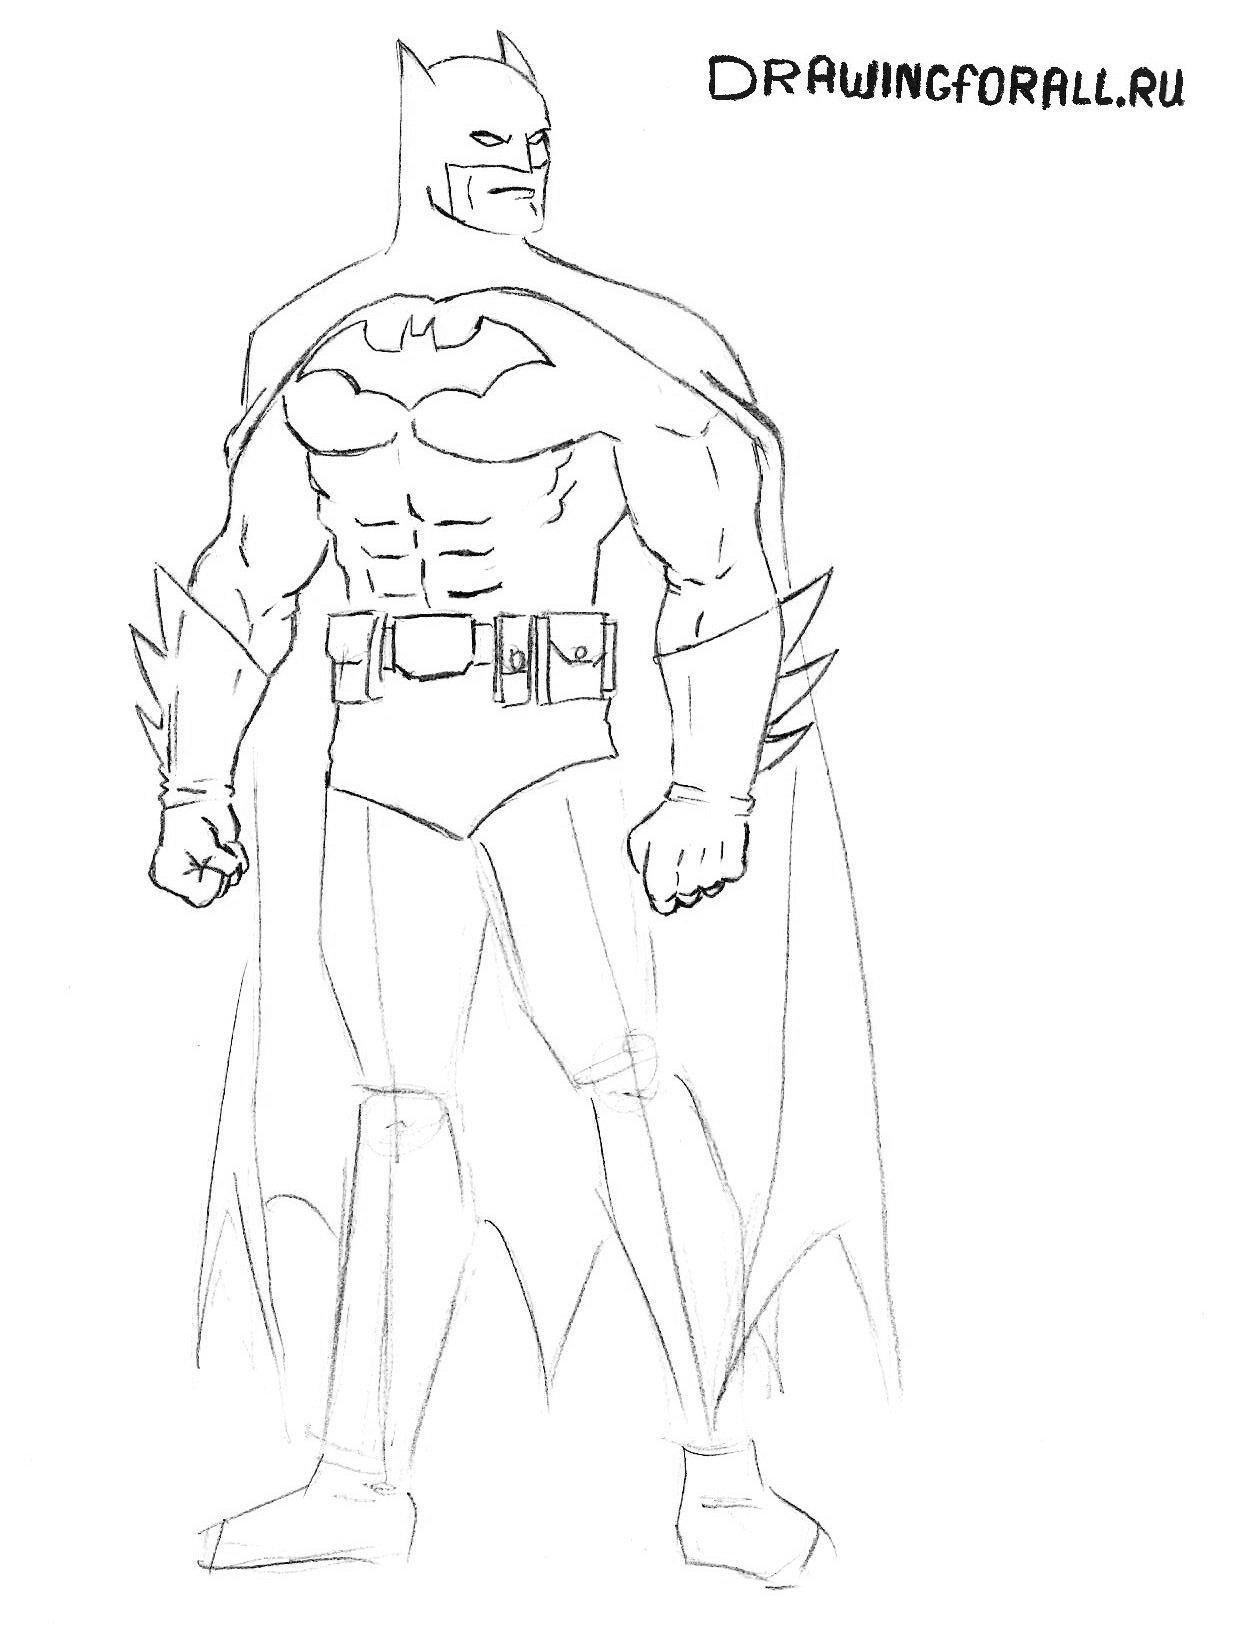 нарисованный бэтмен